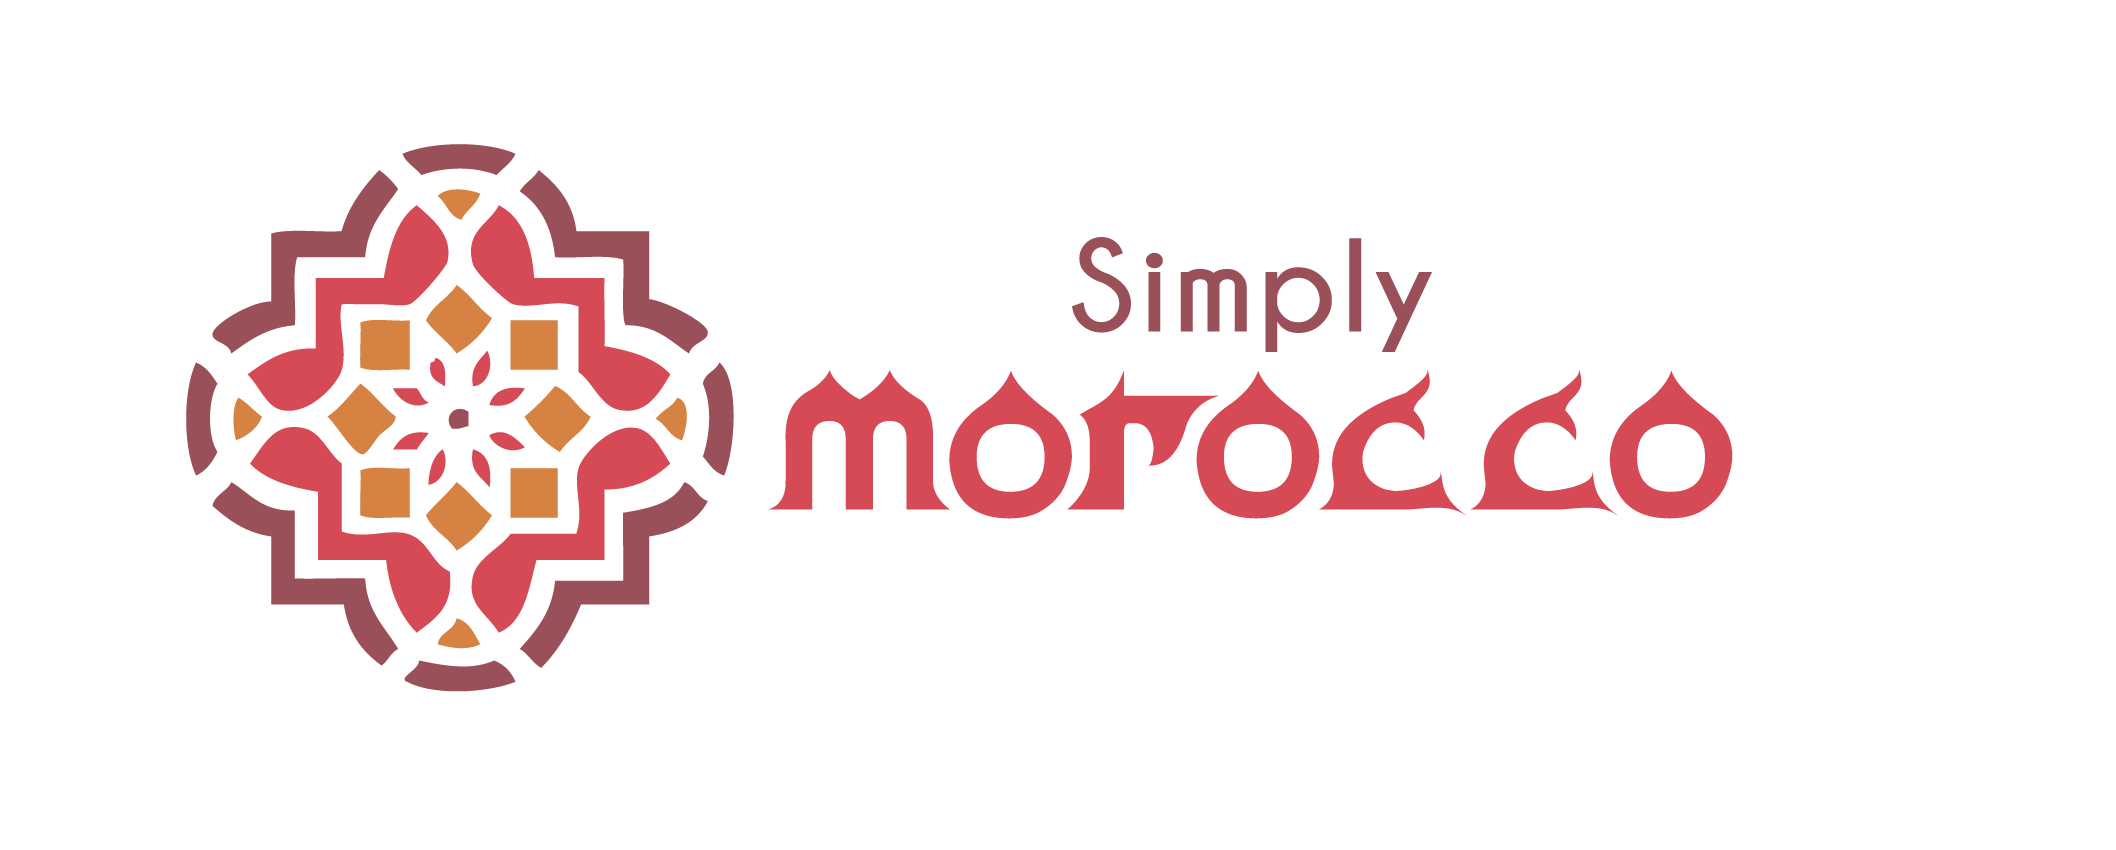 Simply Morocco